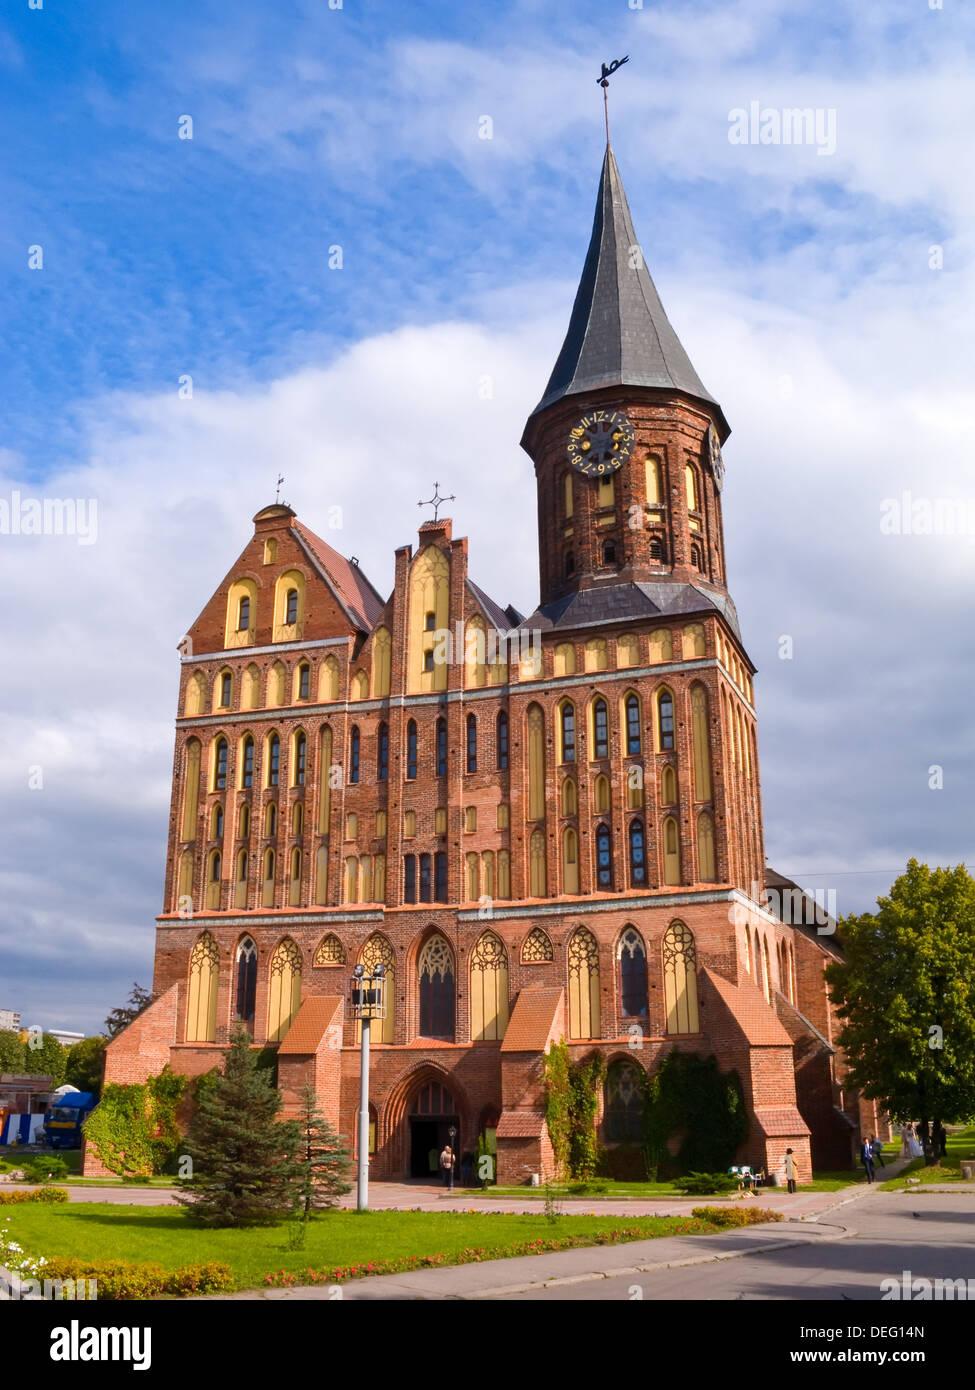 Soviet memorial dedicated to cosmonauts from kaliningrad - Cathedral On Kant S Island Kaliningrad Konigsberg Russia Europe Stock Image